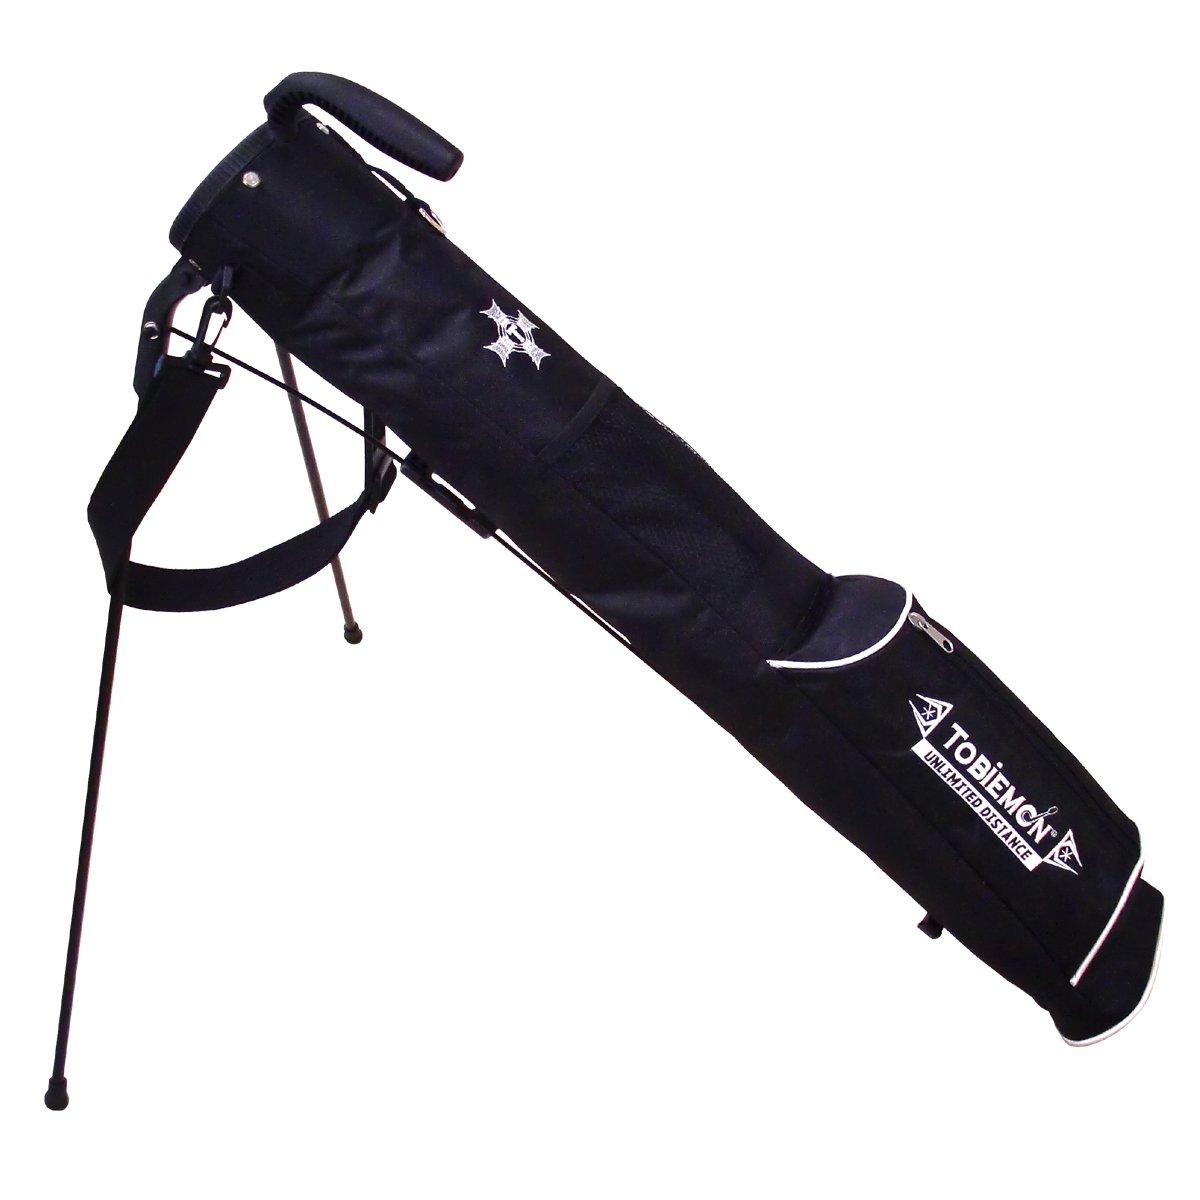 MU Sports Caiton Golf Ball Marker C208 Golf Wear/Women's Vest/Women's Complete Sets/Golf-Club-Complete-Sets